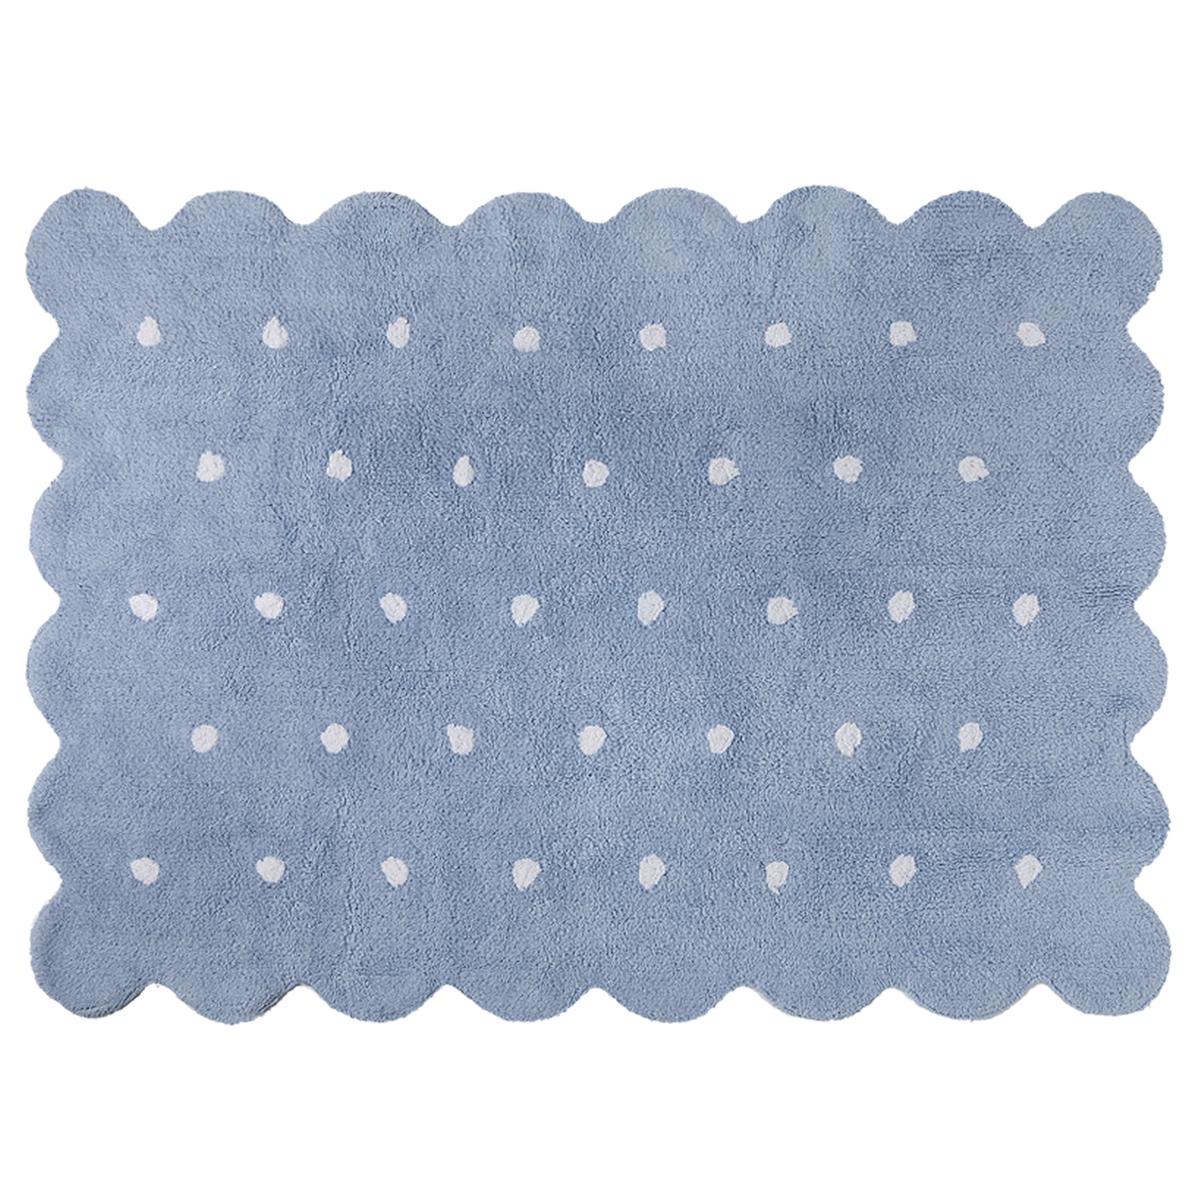 Tapis Tapis Lavable Biscuit Bleu - 120 x 160 cm Tapis Lavable Biscuit Bleu - 120 x 160 cm